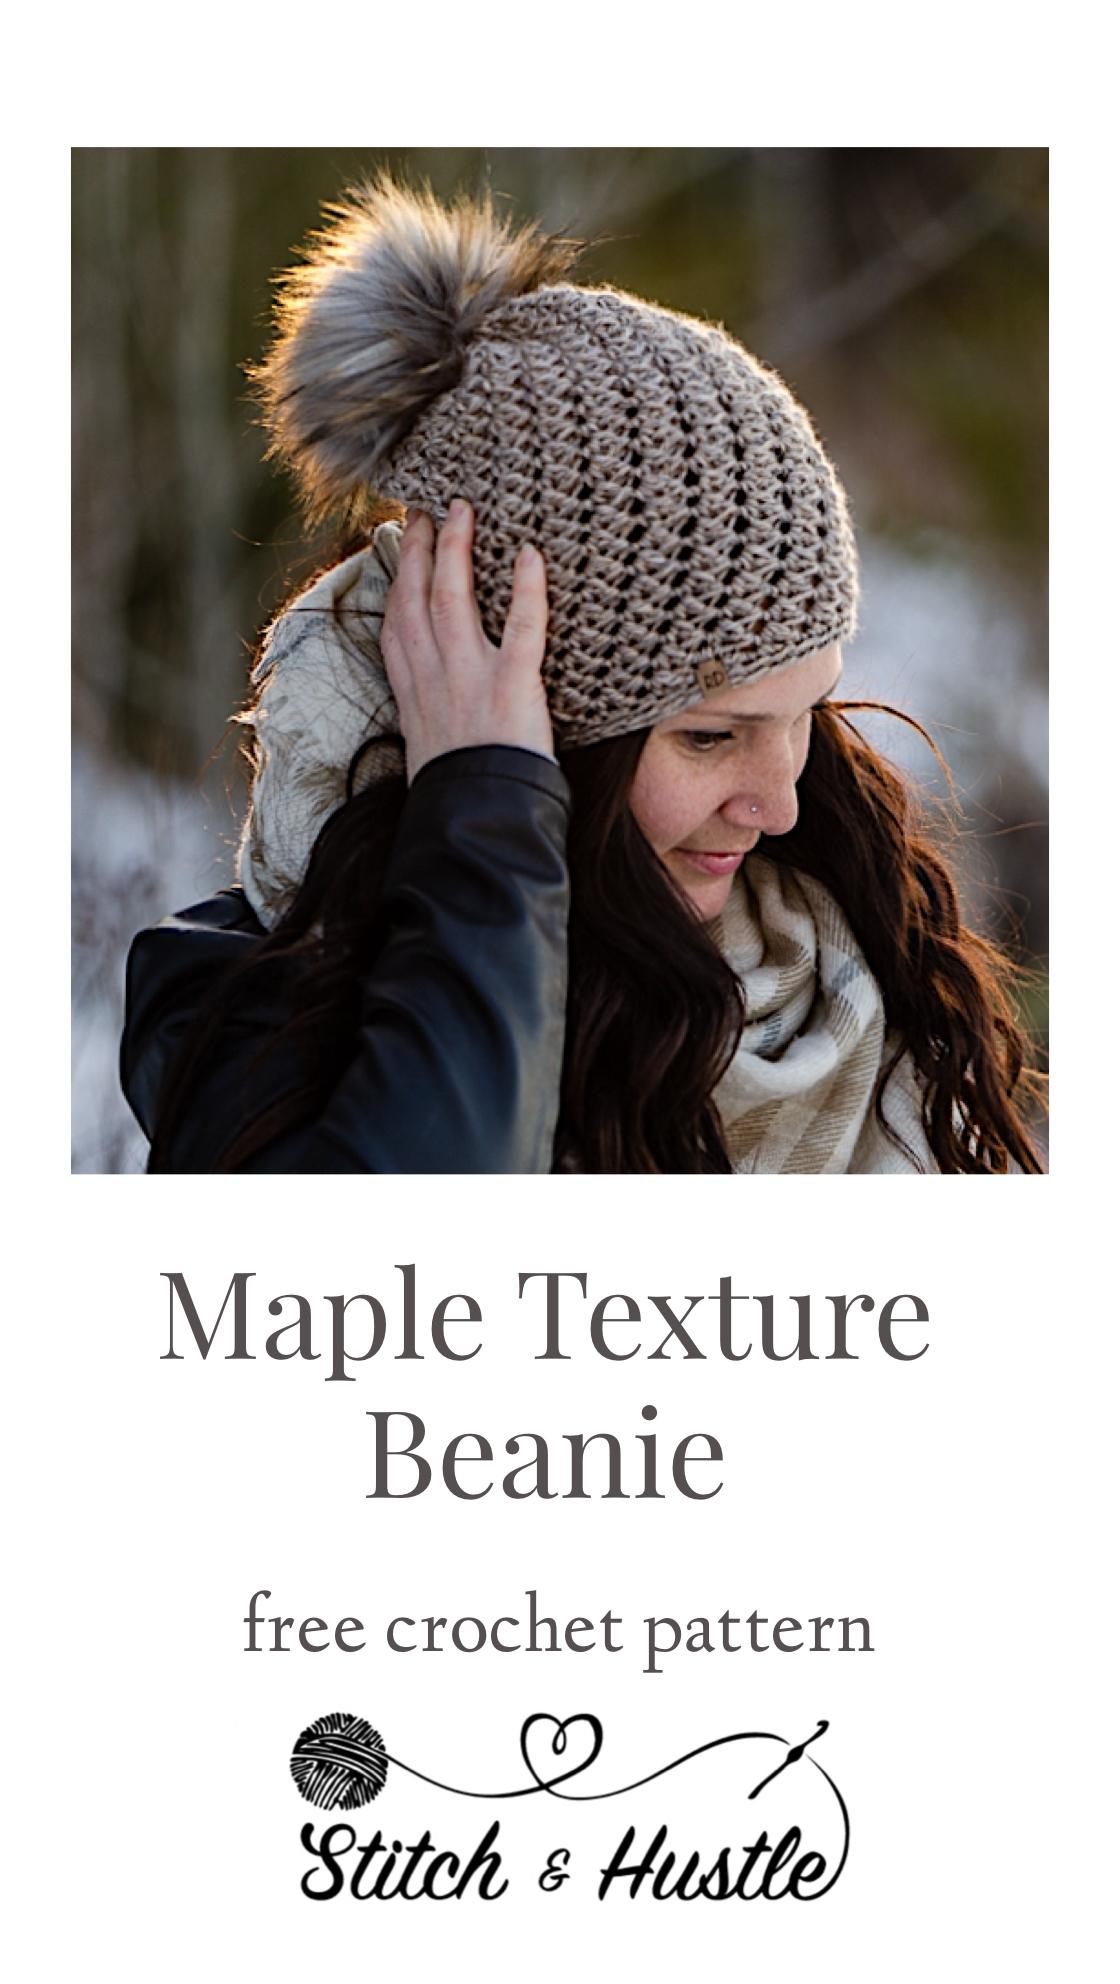 maple_texture_beanie_free_crochet_pattern_1gg.jpg